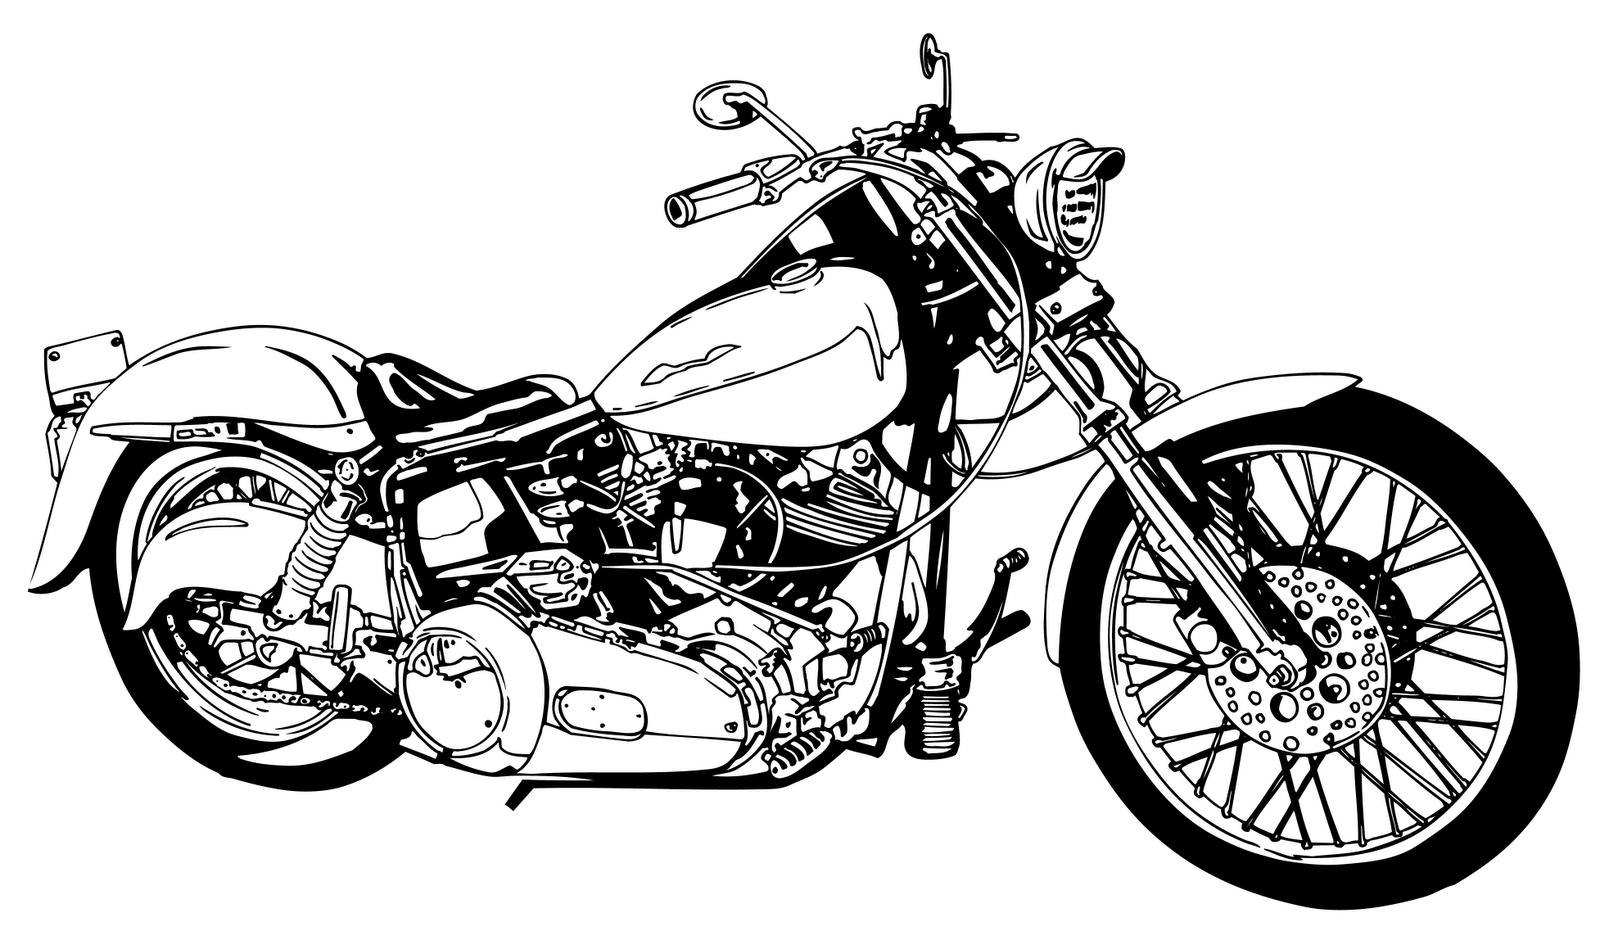 Chopper clip art . Motorcycle clipart motorcycle harley davidson